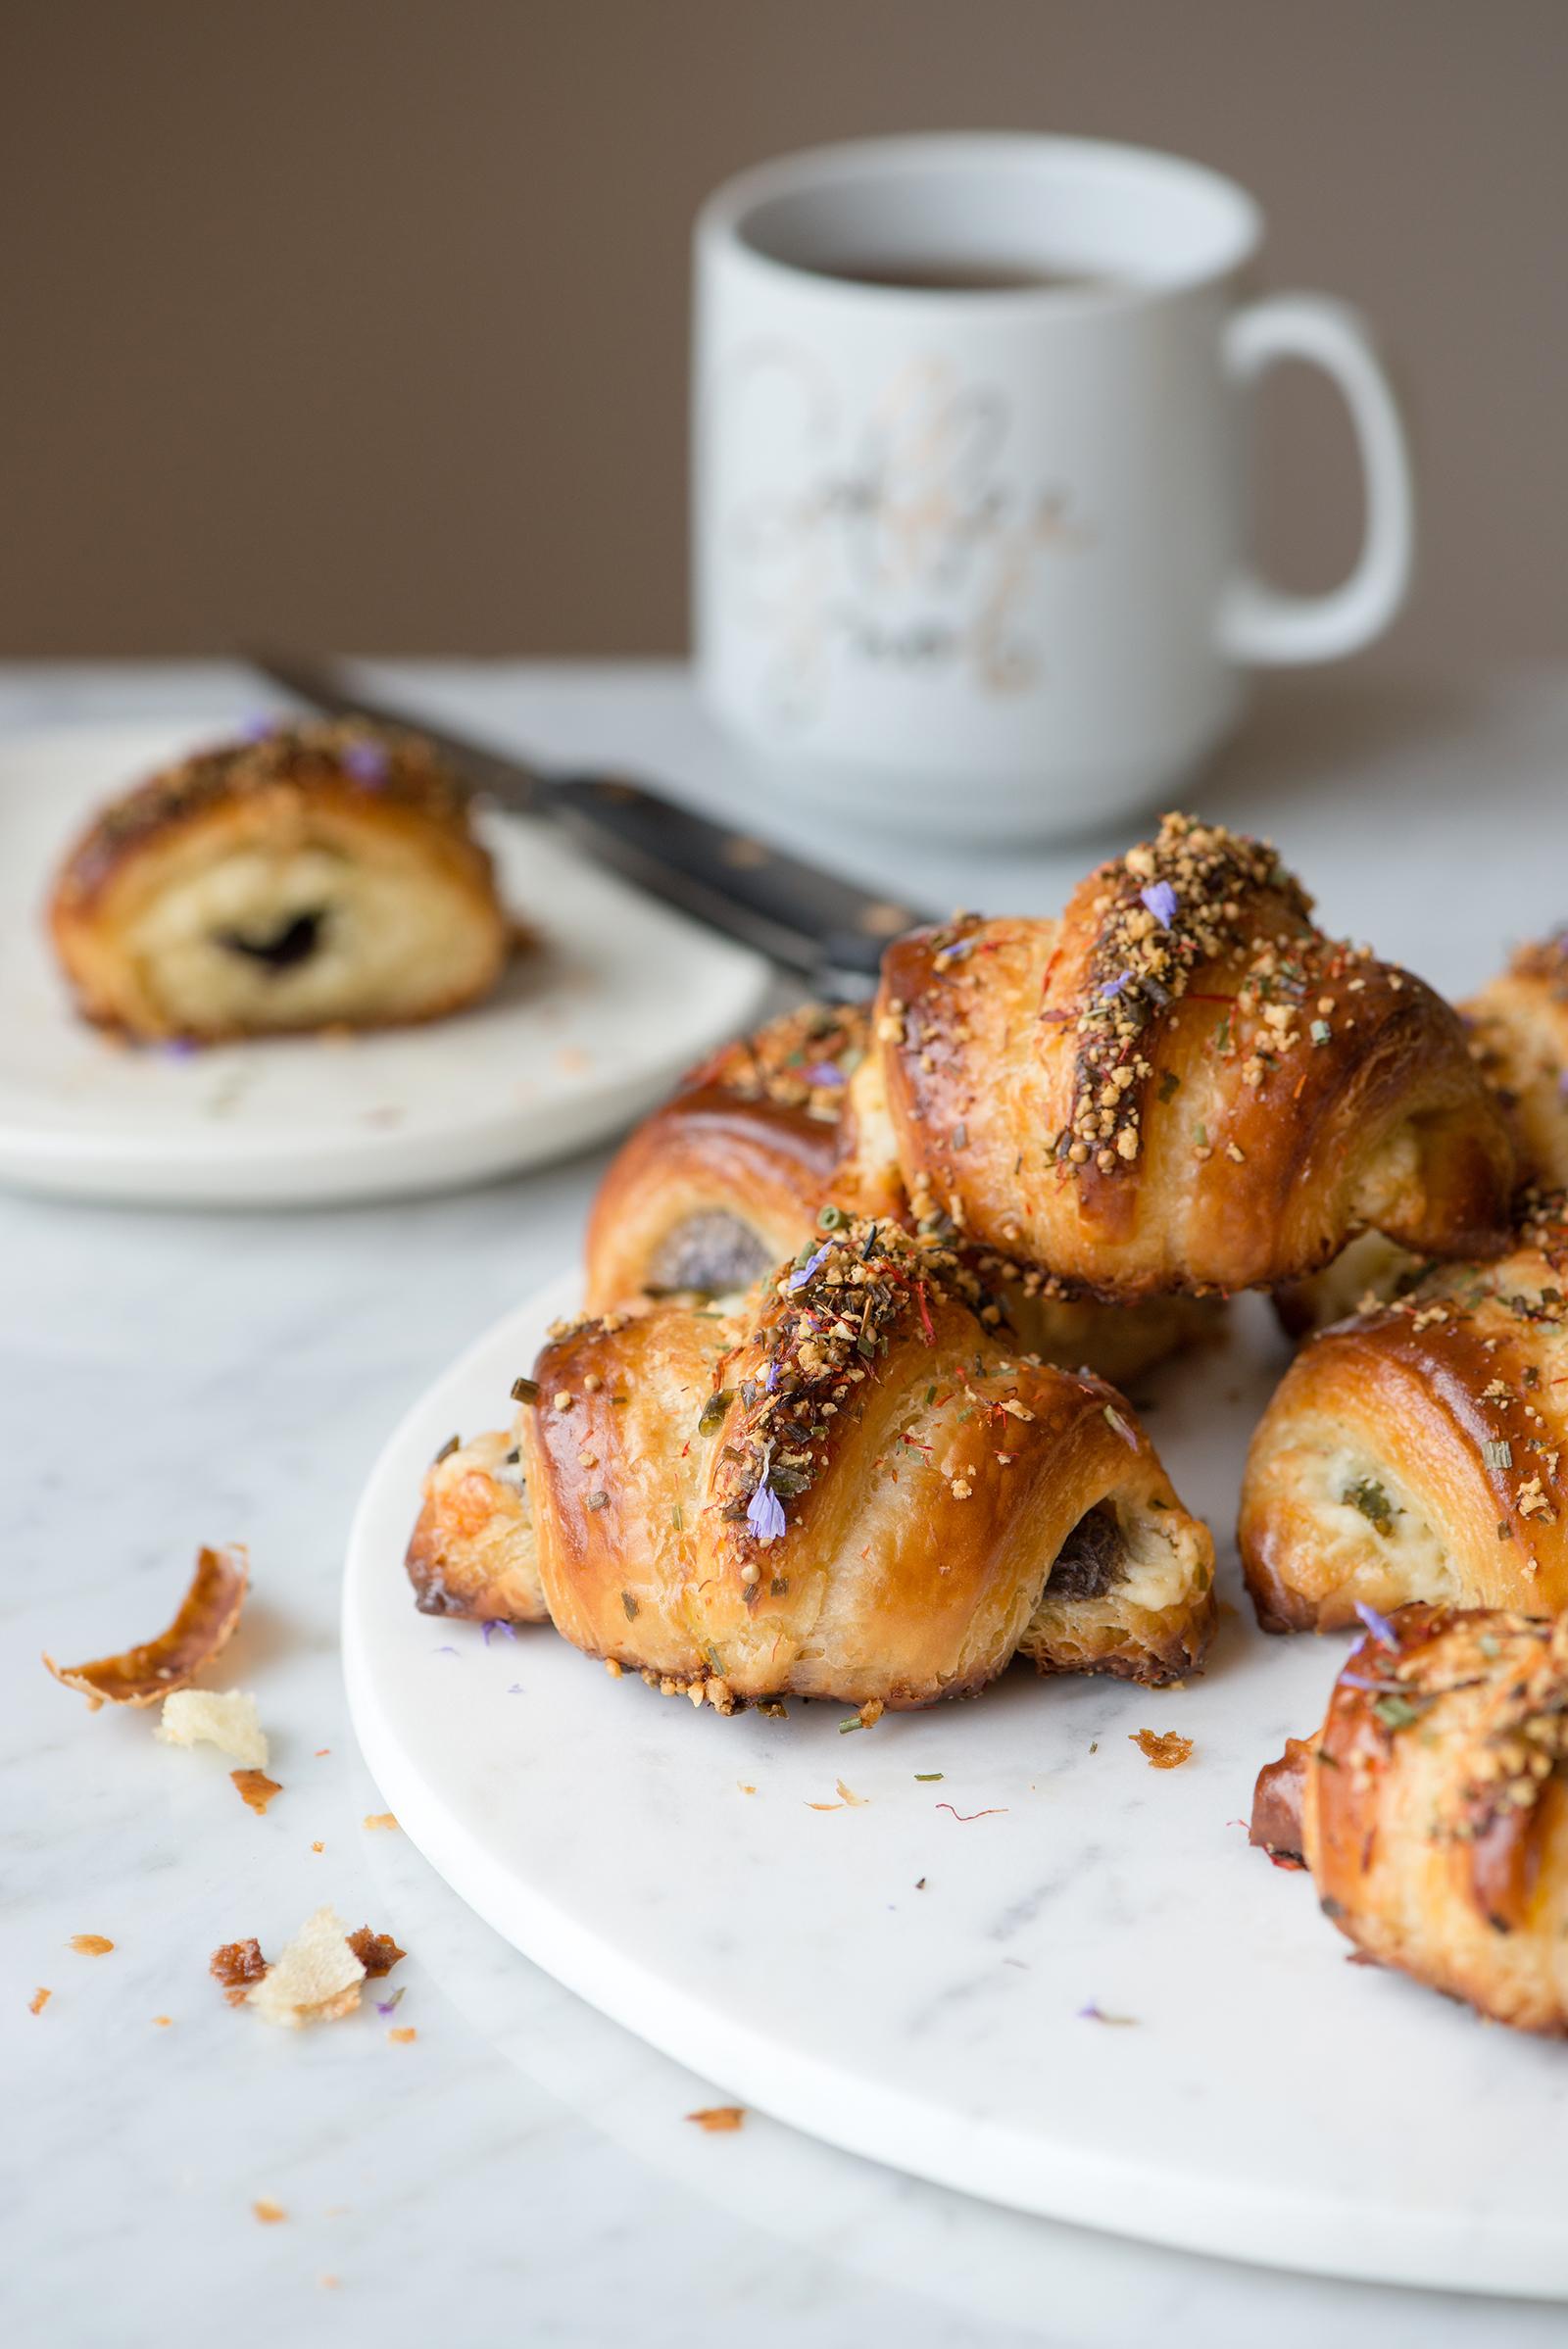 Purple Potato, Asparagus And Havarti Savory Stuffed Croissants | Now, Forager | Teresa Floyd